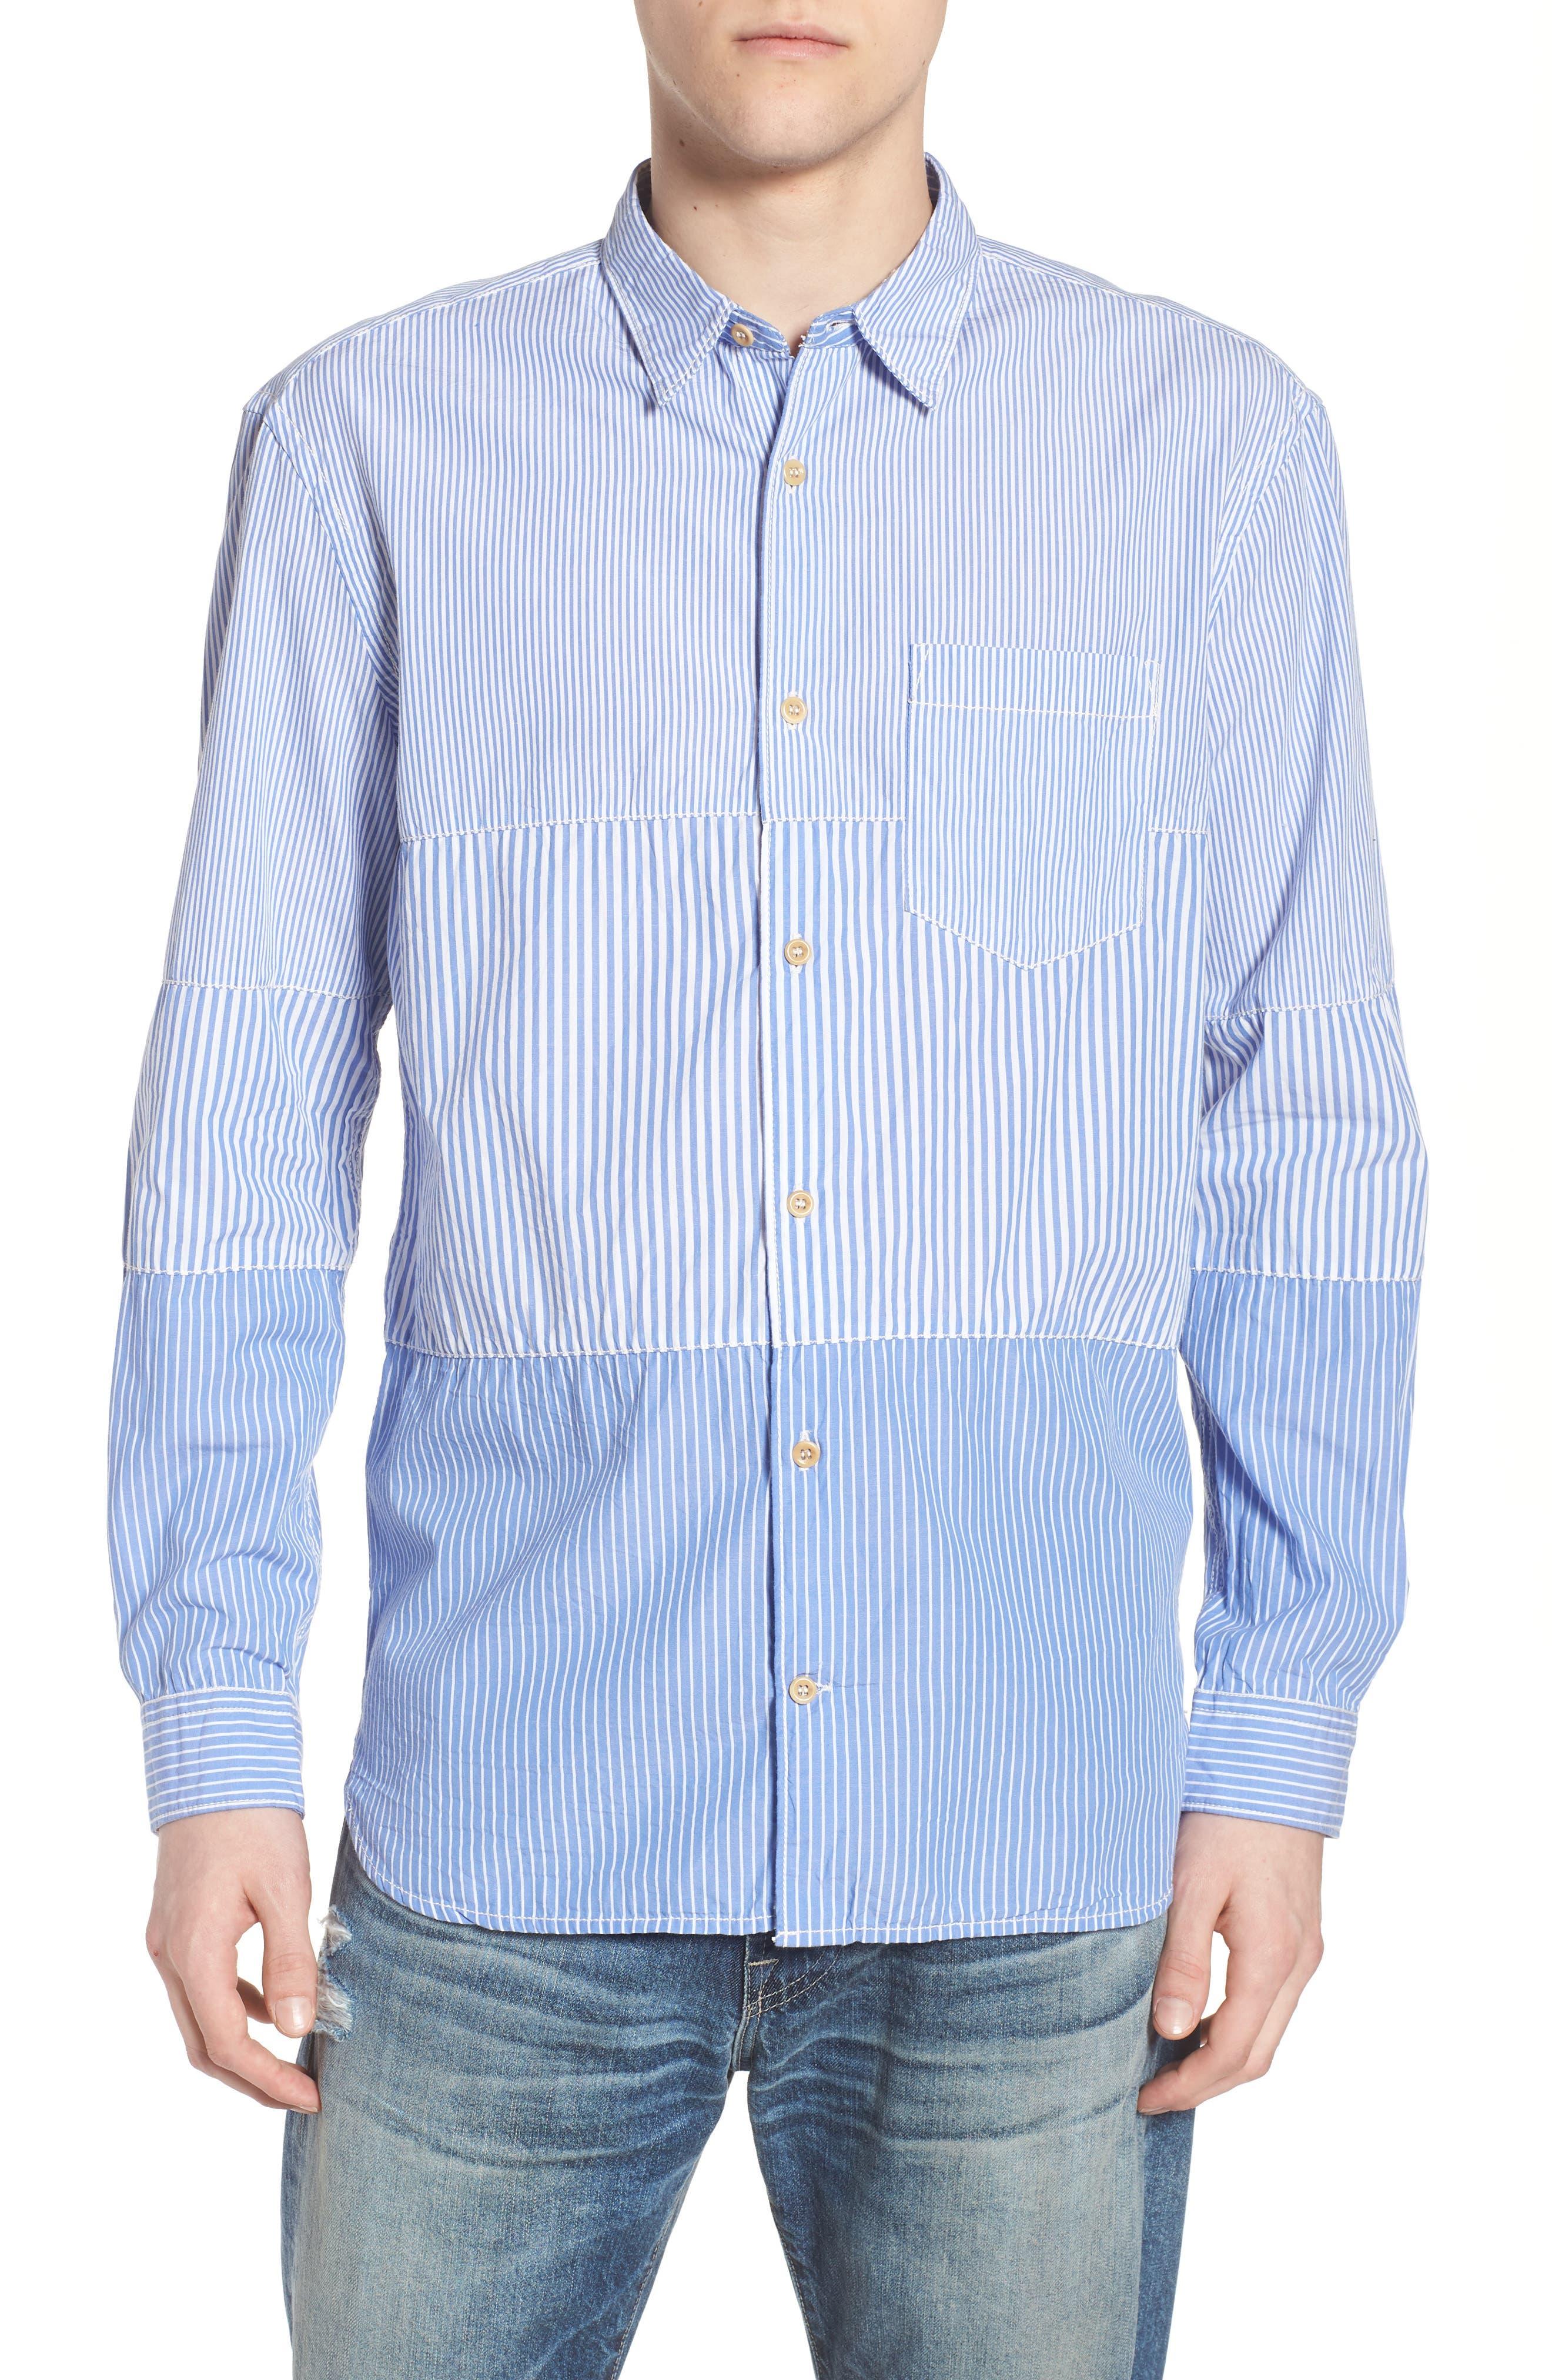 Regular Fit Stripe Sport Shirt,                             Main thumbnail 1, color,                             All Stripe